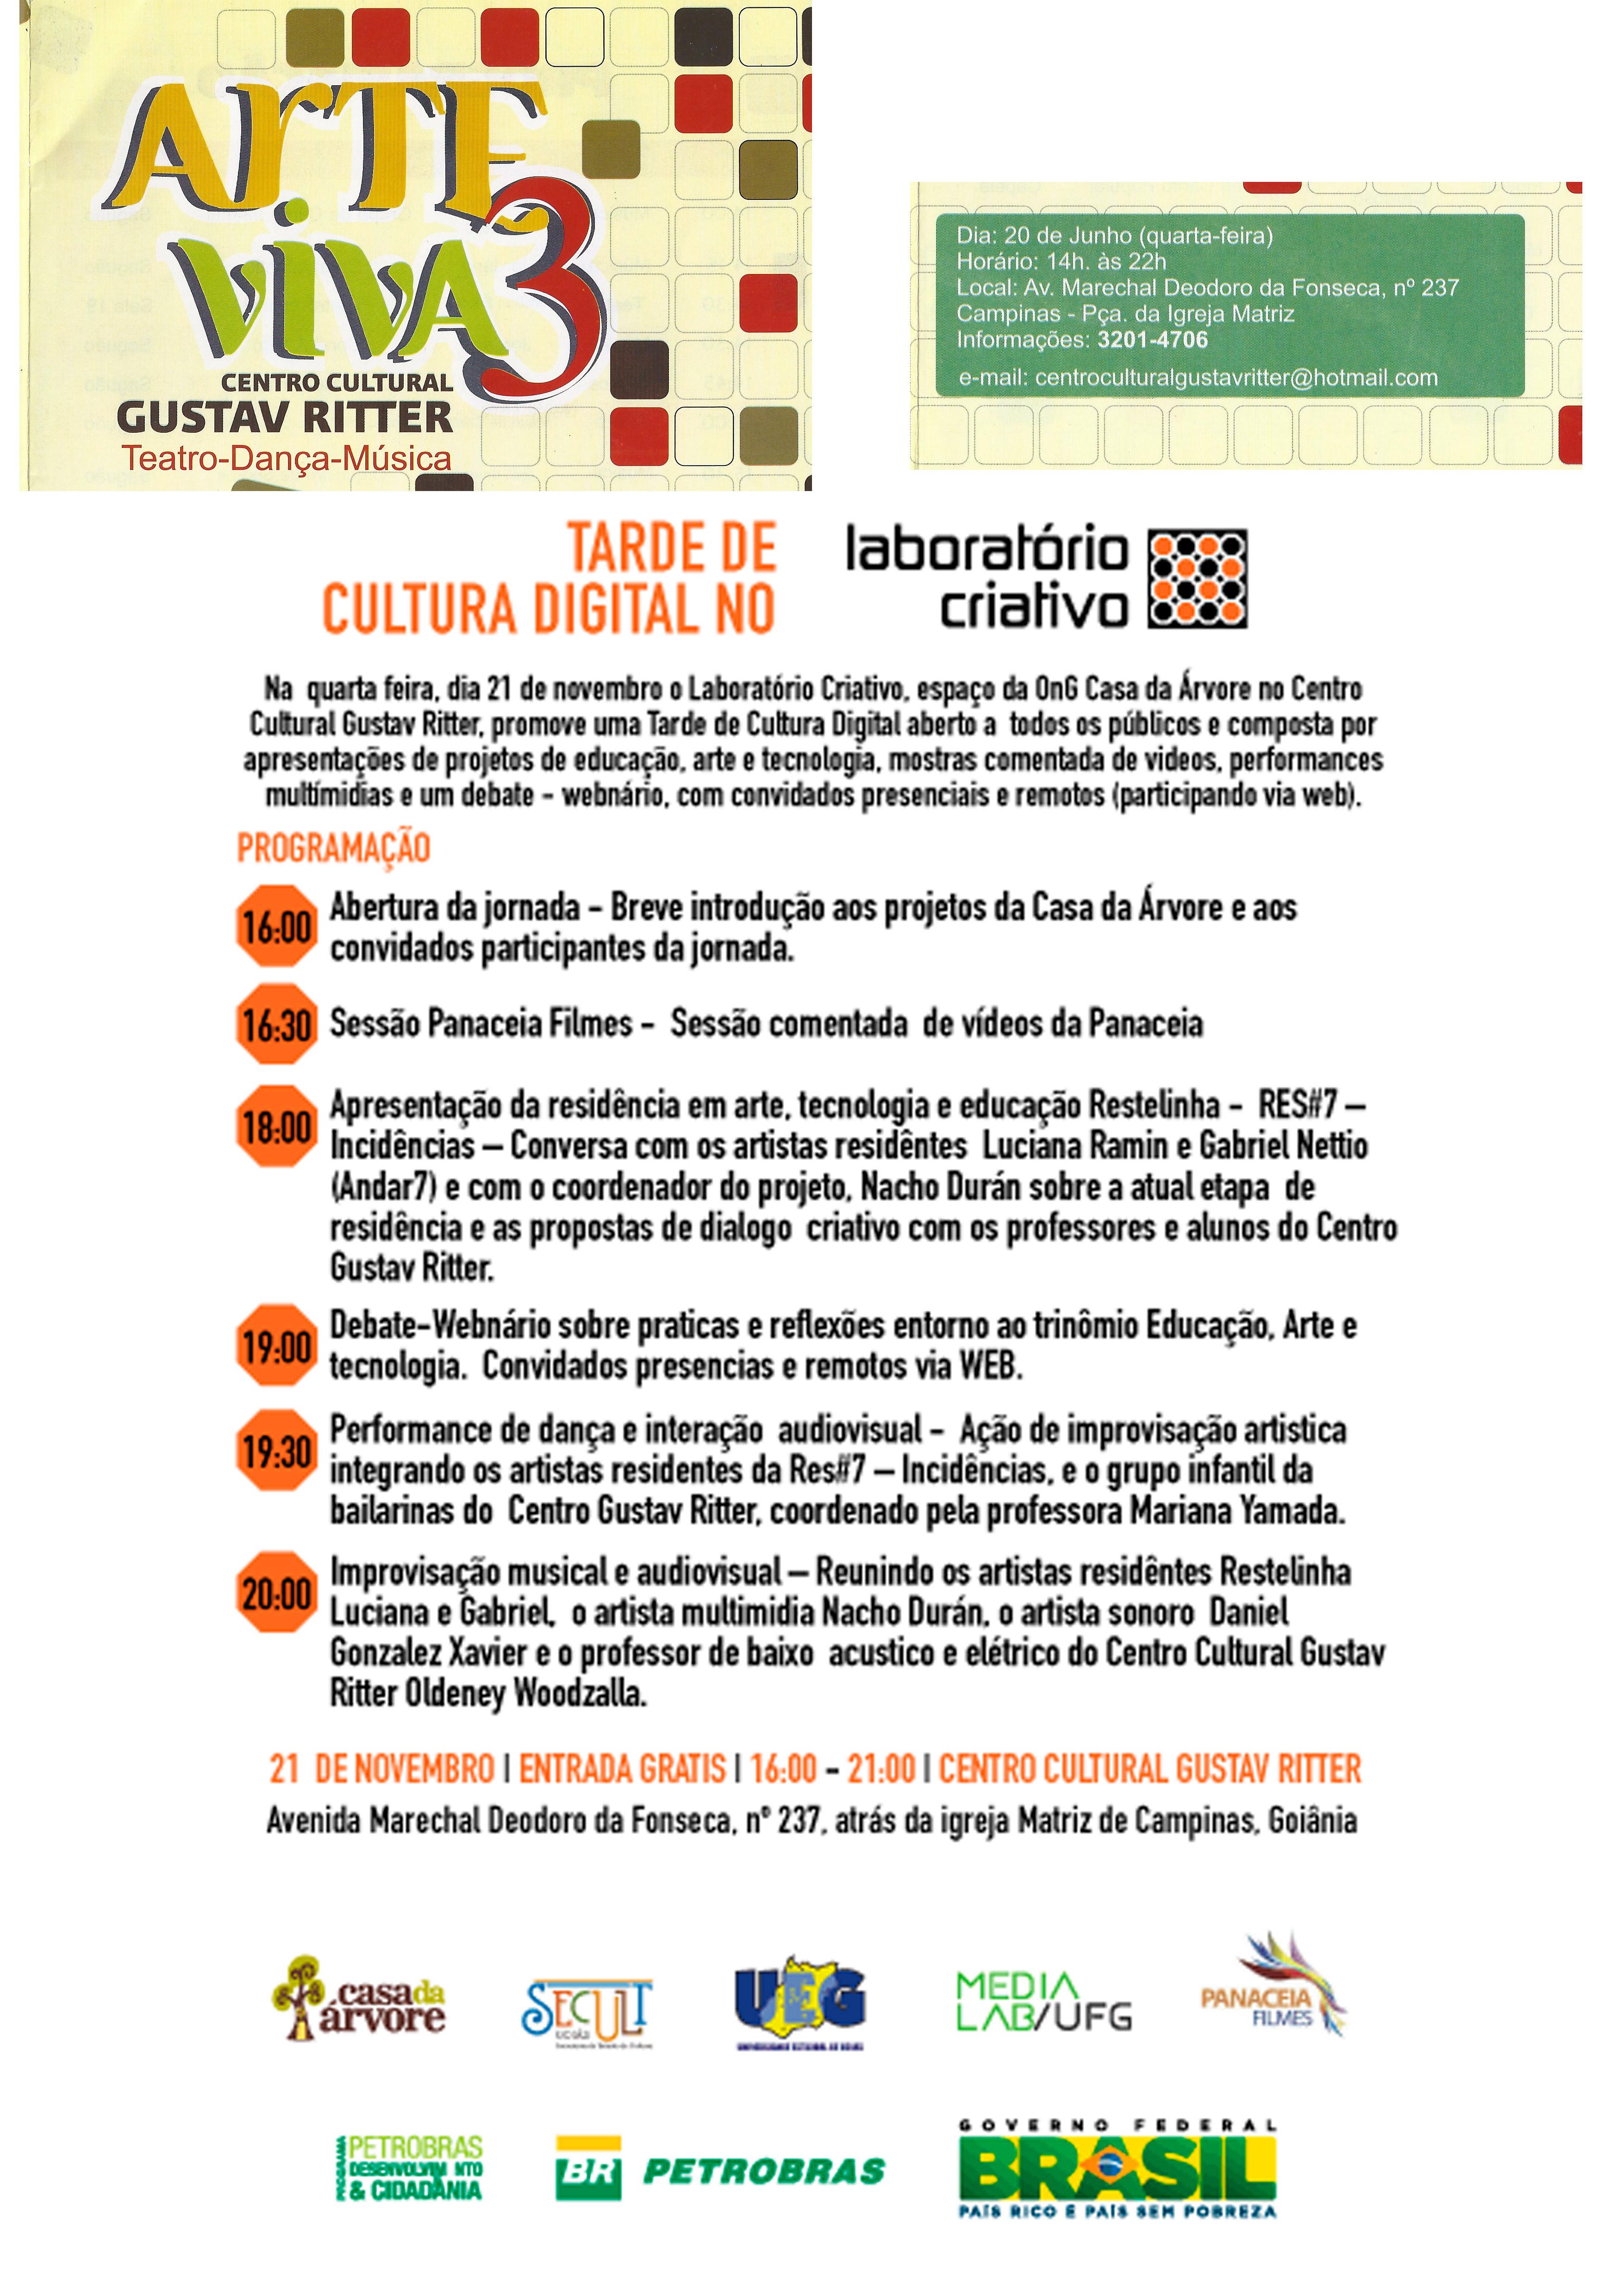 rascunho-crtaz-arteviv-laboratorio-criativo